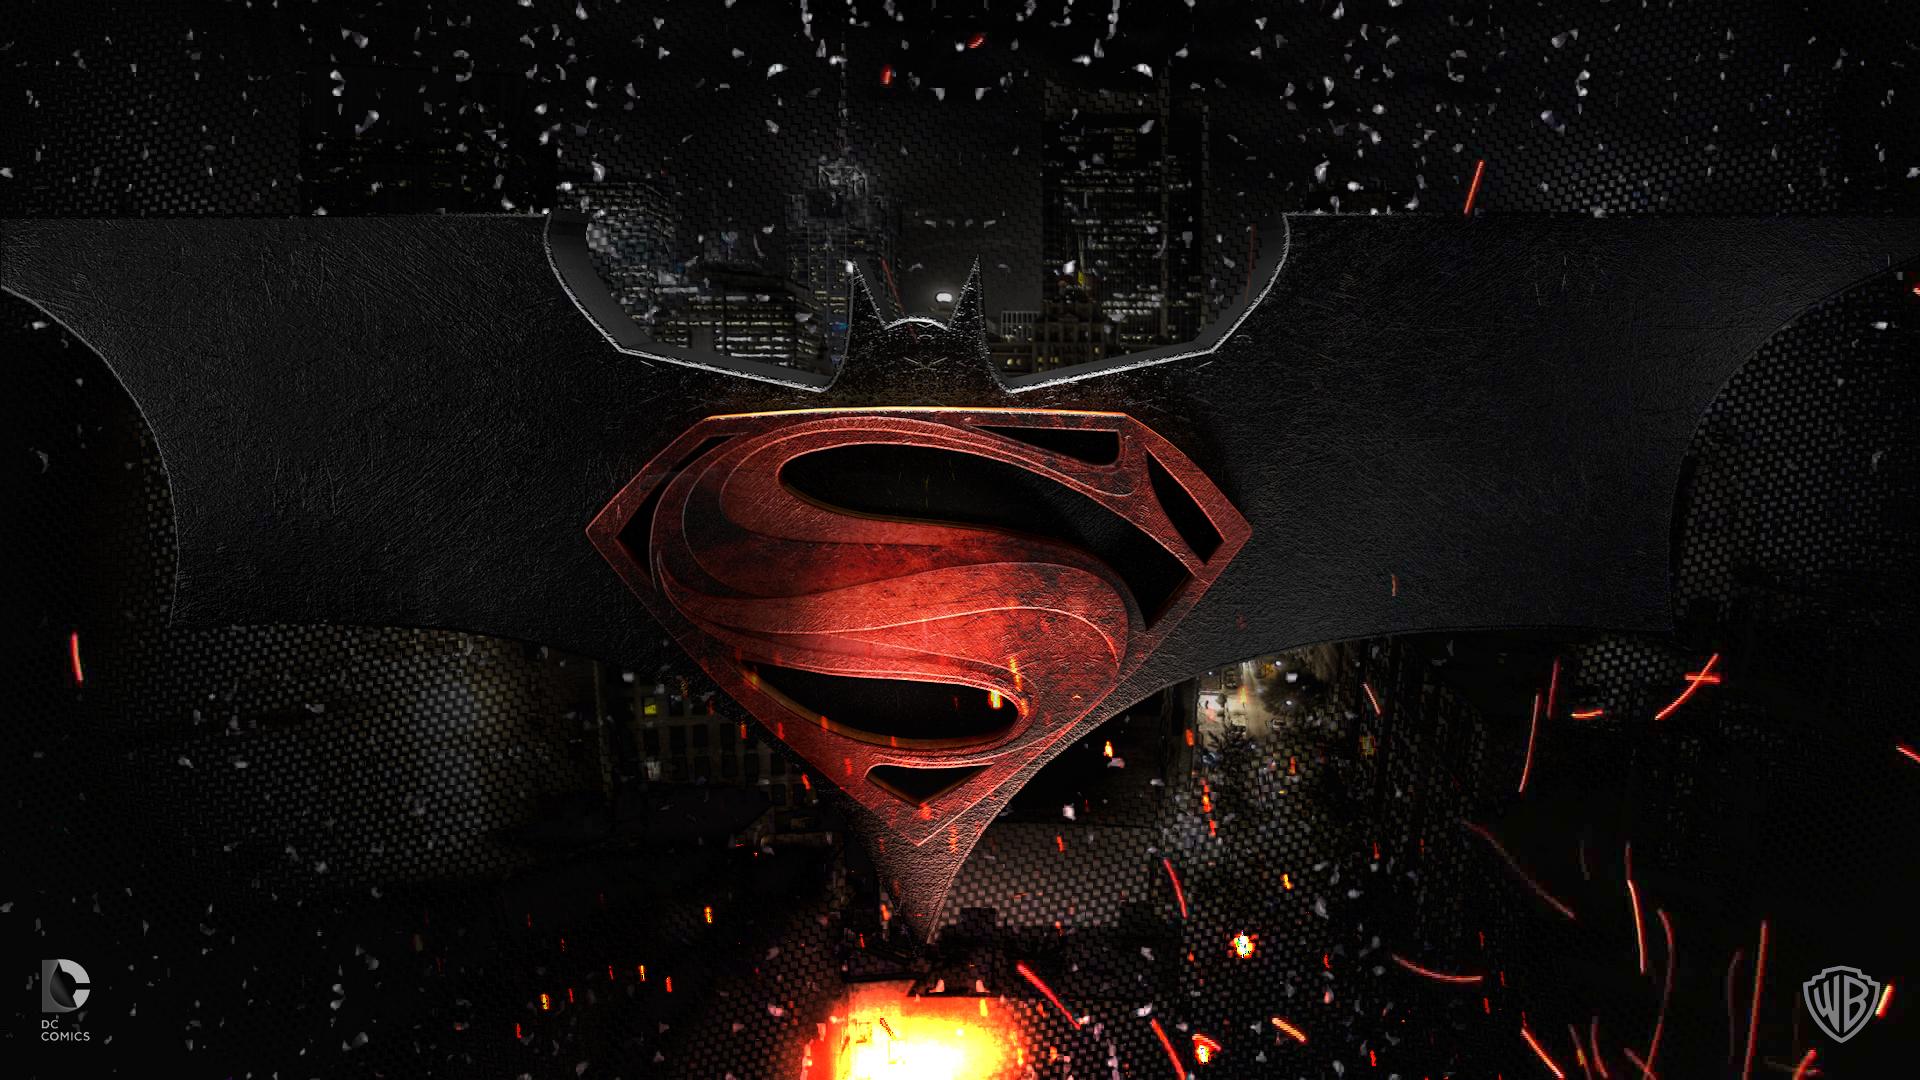 0772aworld s fper   superman batman by alex4everdn d5yj70mjpg 1920x1080